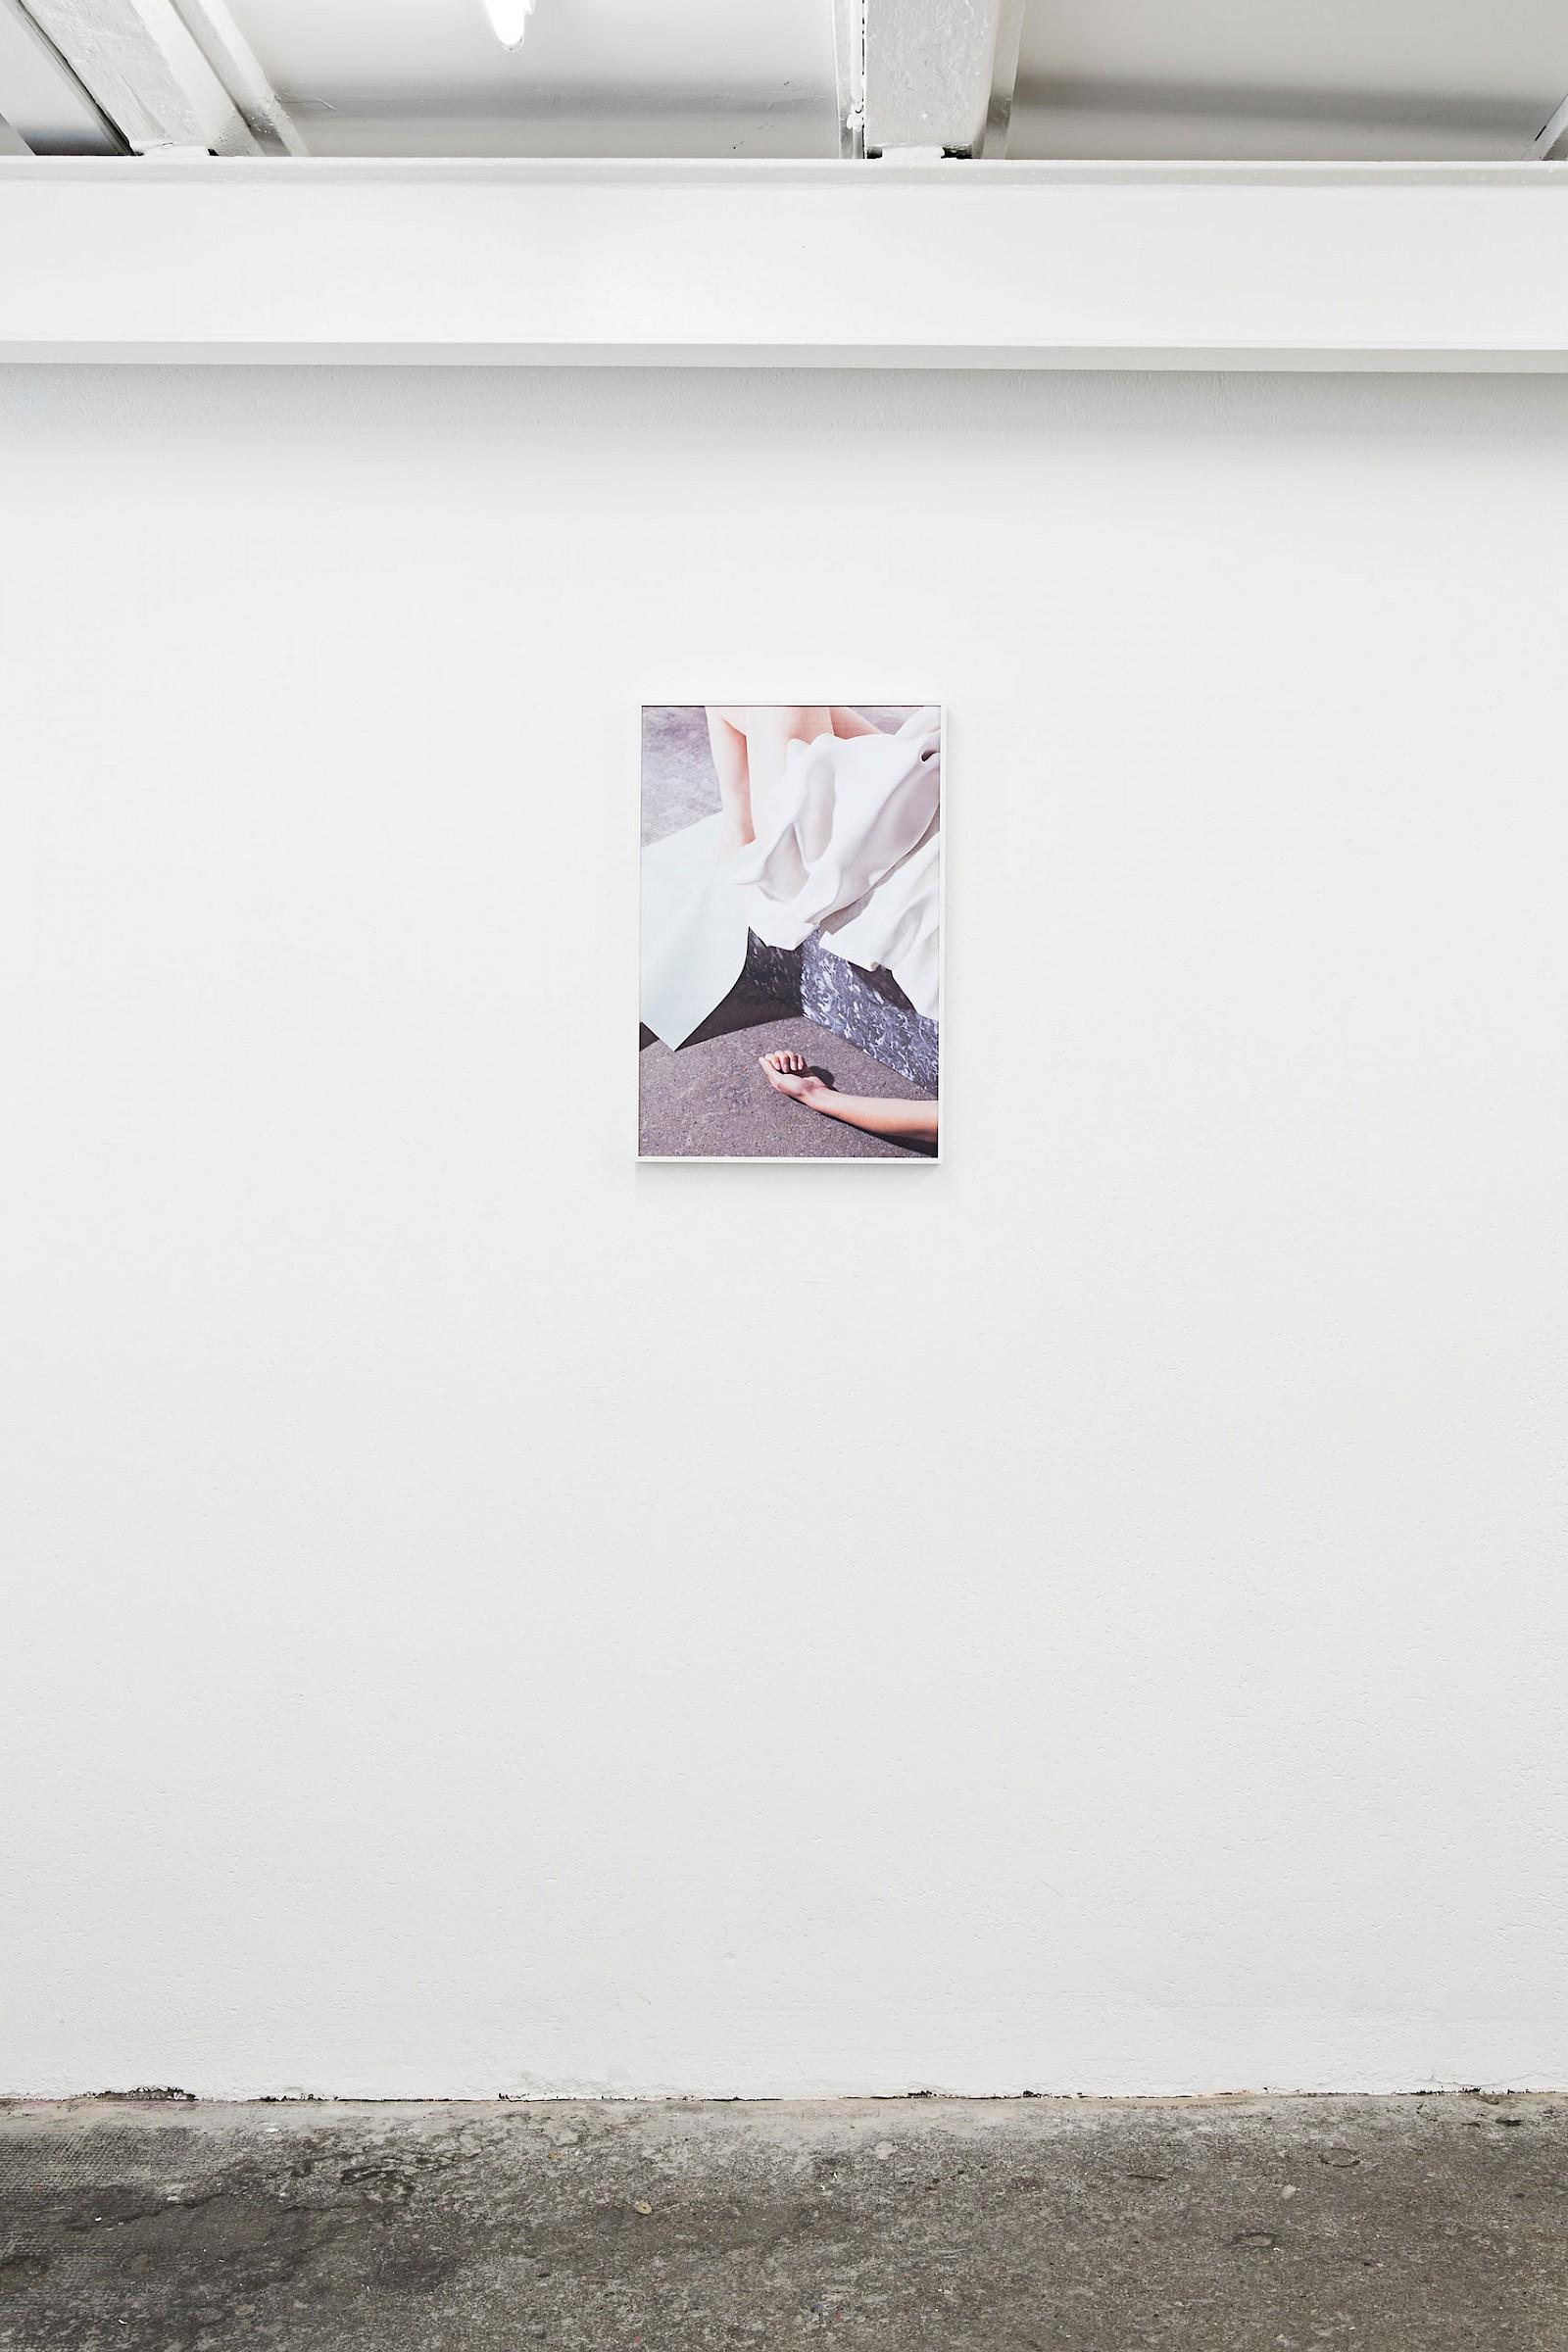 Image - Photograph C-Print framed, Size: 29 x 42cm